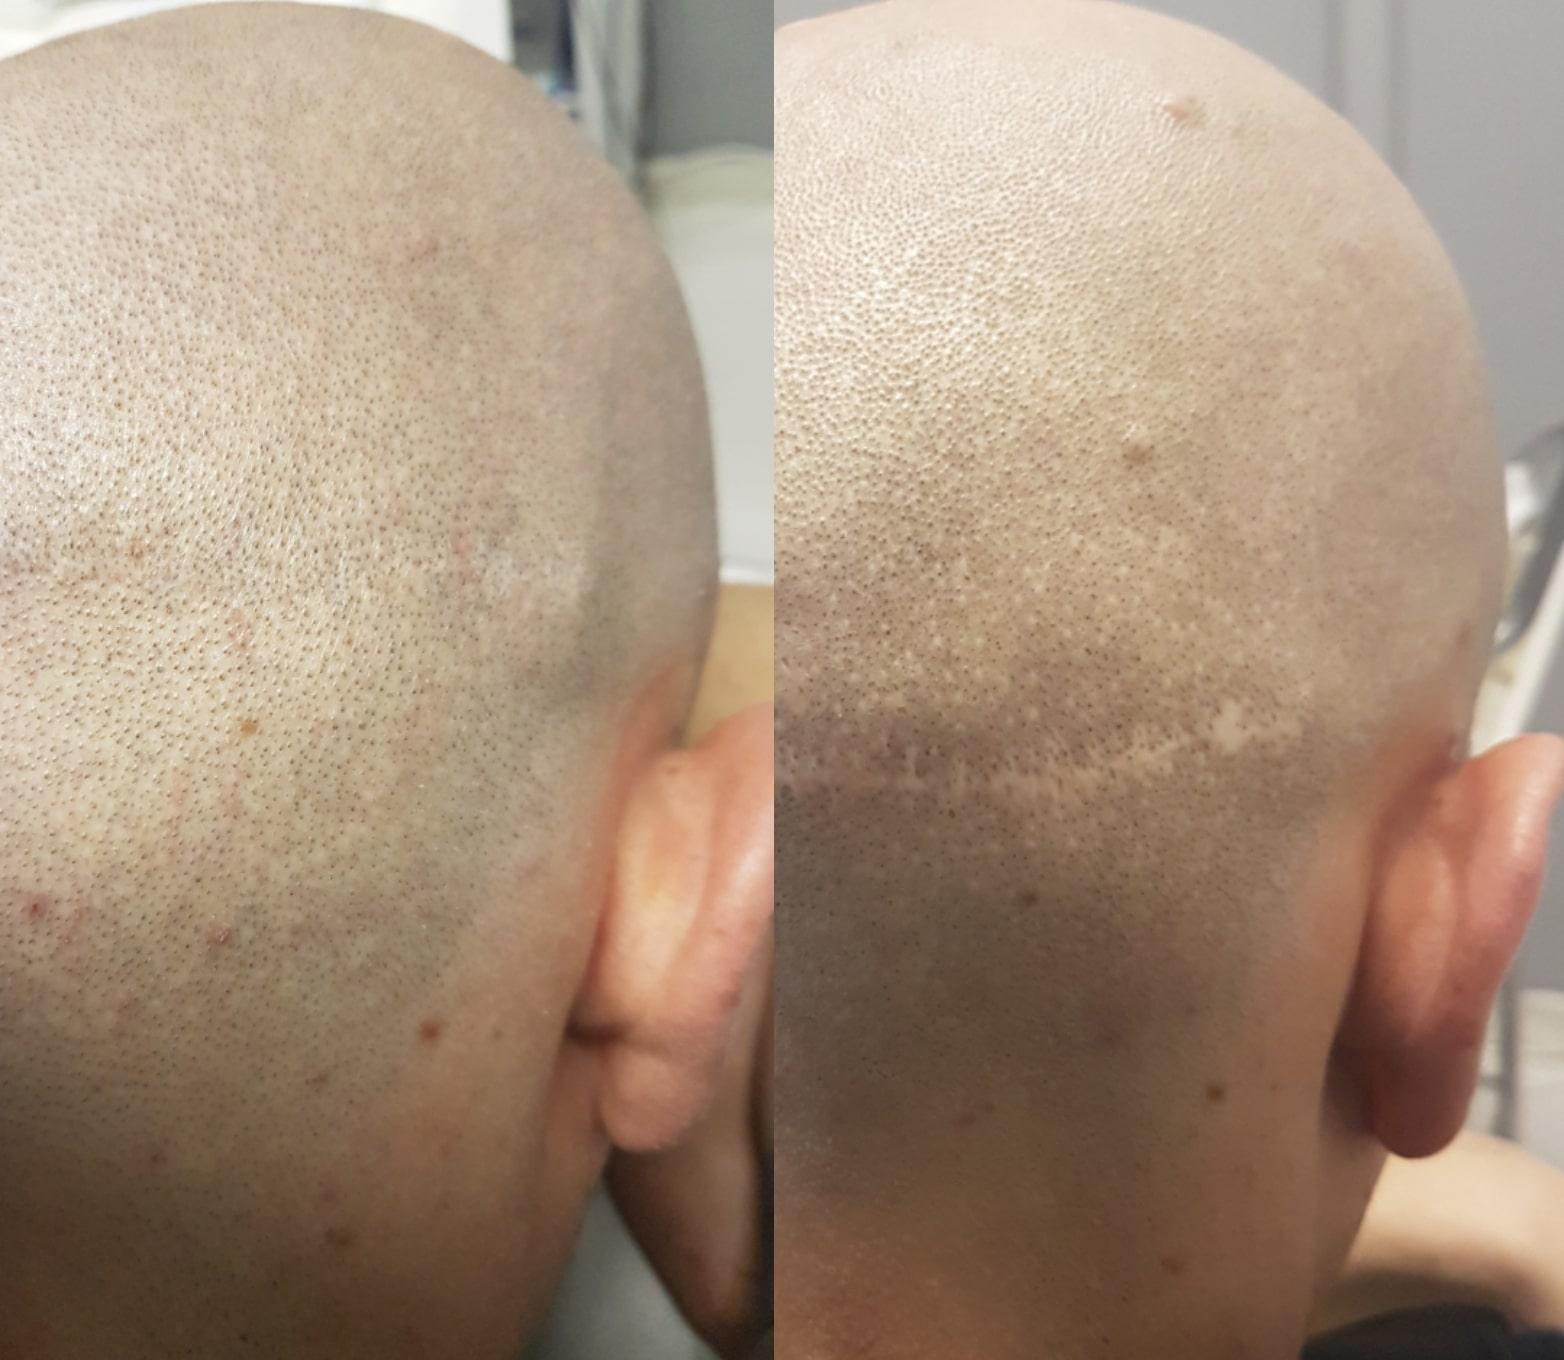 HT Scars Scalp Micropigmentation can fix